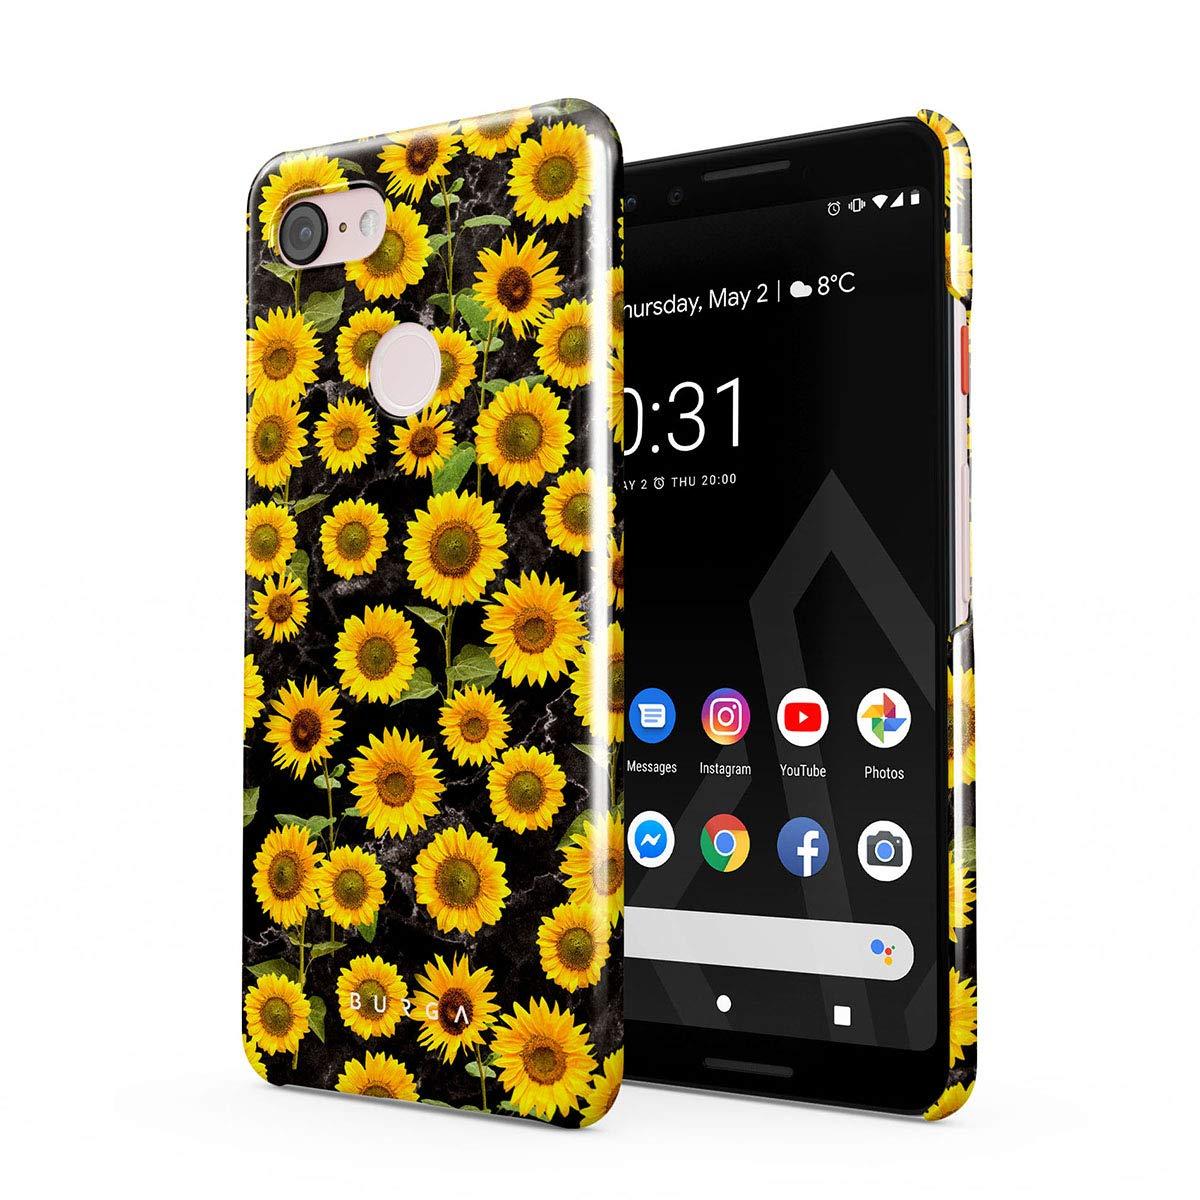 BURGA Phone Case Compatible with Google Pixel 3 - Yellow Sunflowers Vinatge Flowers Floral Print Pattern Fashion Designer Cute Case for Women Thin Design Durable Hard Plastic Protective Case